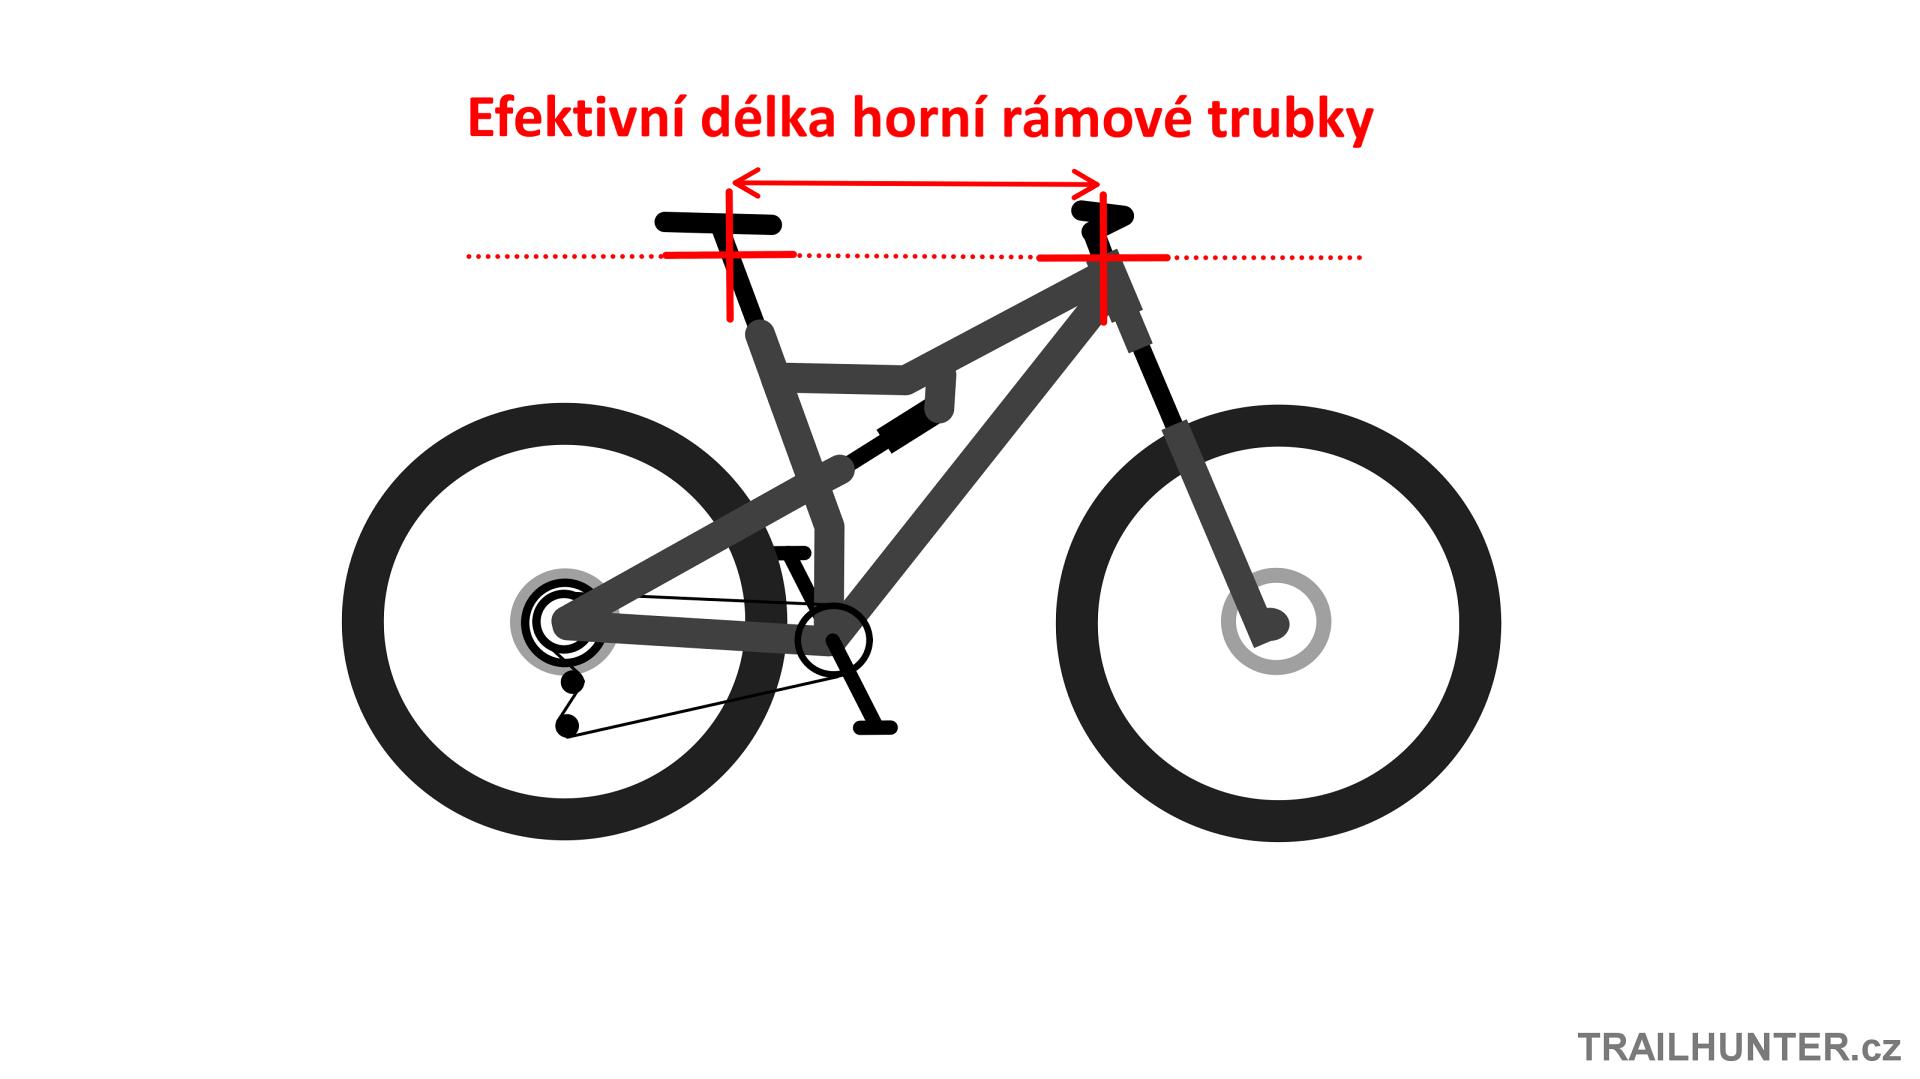 horní rámová trubka - geometrie ramu